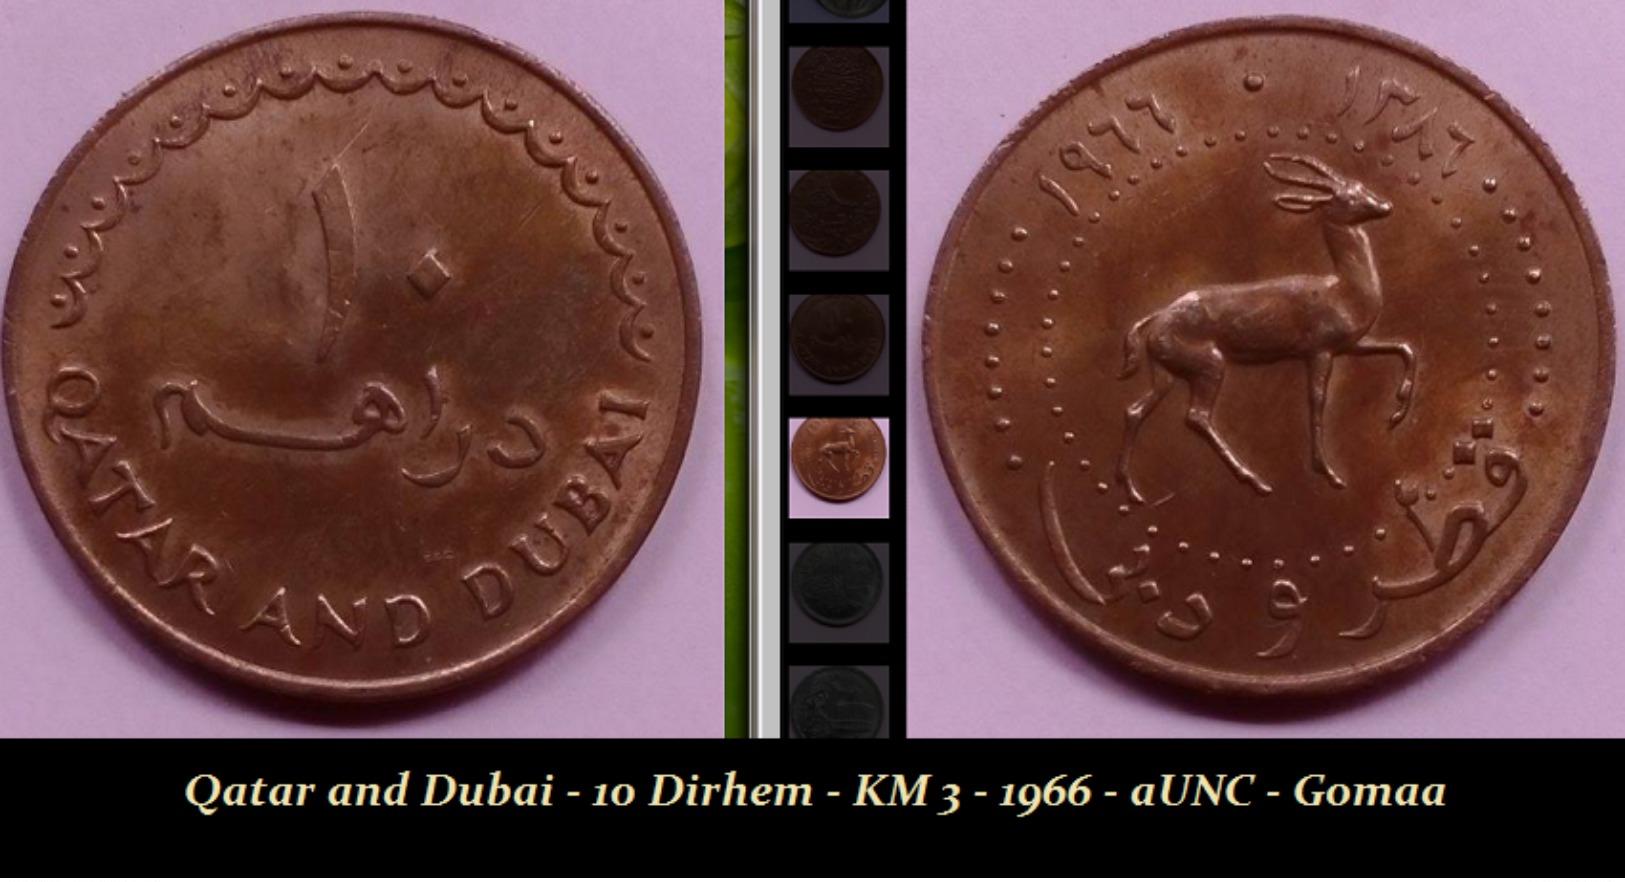 Qatar And Dubai - 10 Dirhem - KM 3 - 1966 - AUNC - Gomaa - Emirats Arabes Unis